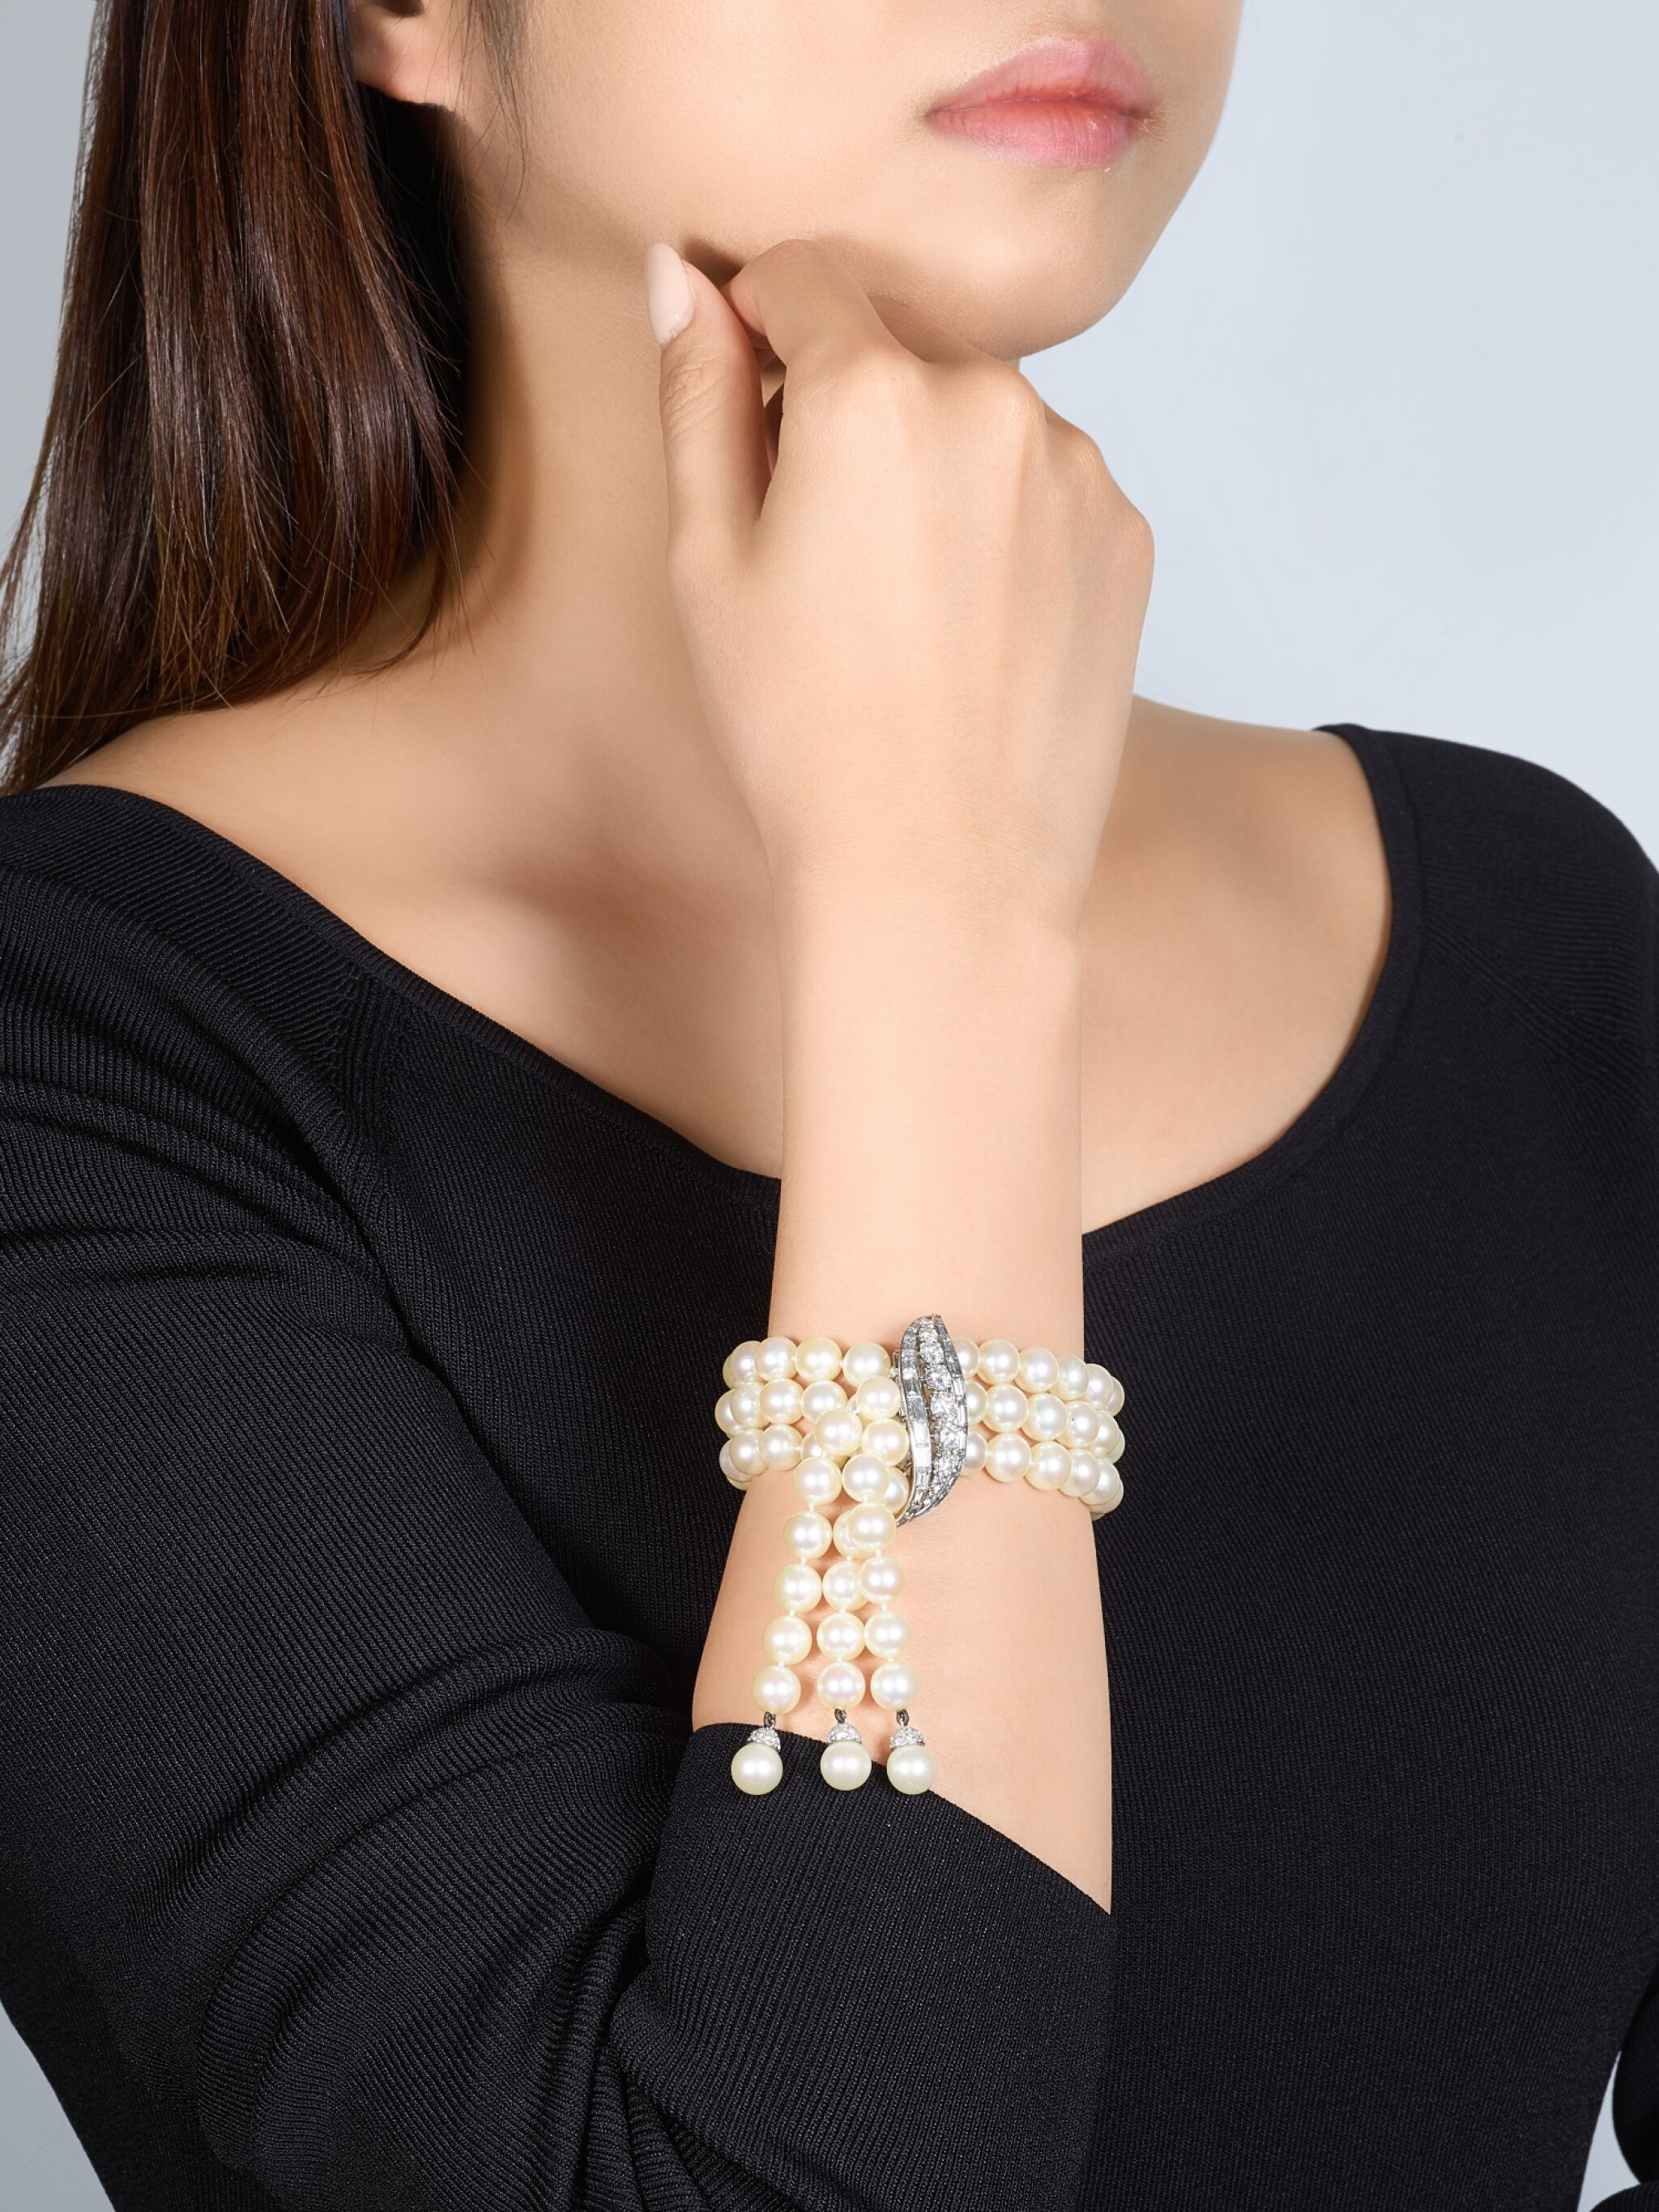 View full screen - View 1 of Lot 9037. 'Flammes' Cultured Pearl and Diamond Bracelet   梵克雅寶   'Flammes' 養殖珍珠 配 鑽石 手鏈.